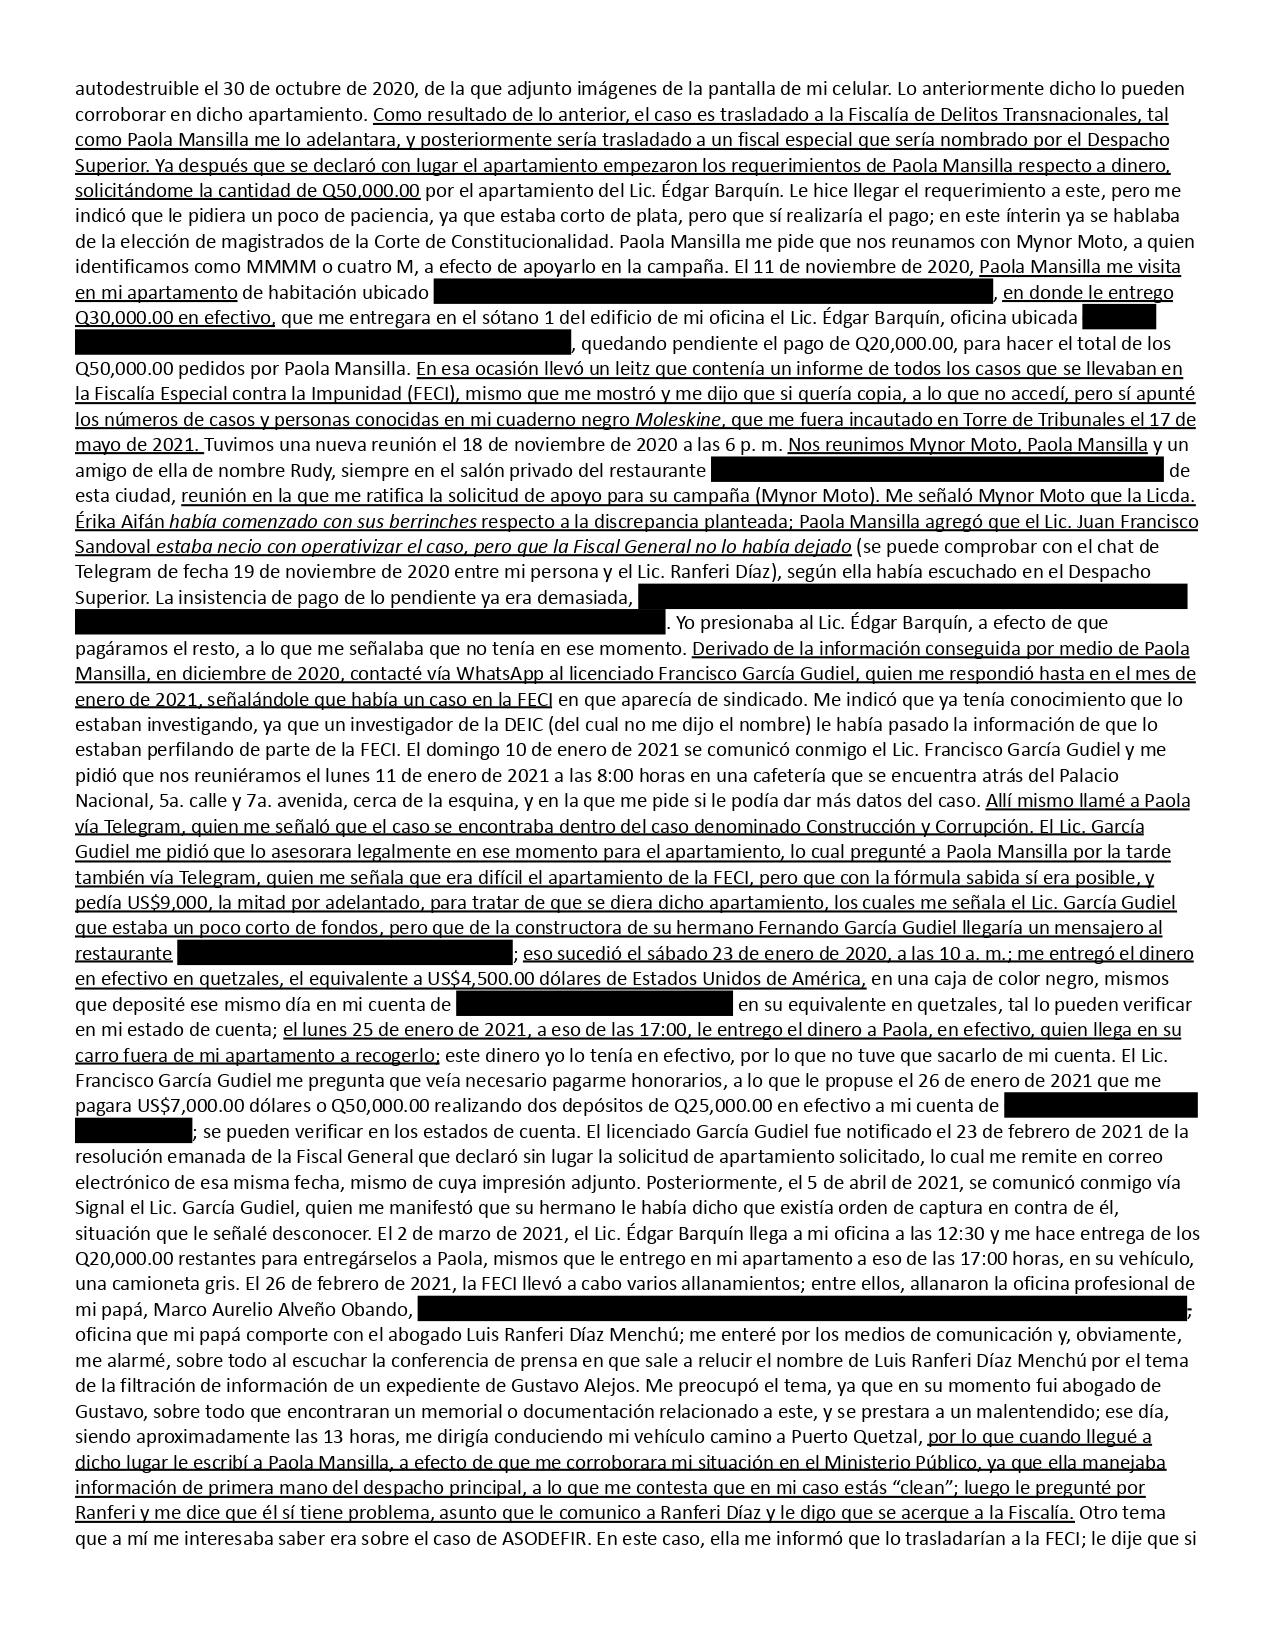 elPeladero.docx (1)_page-0002